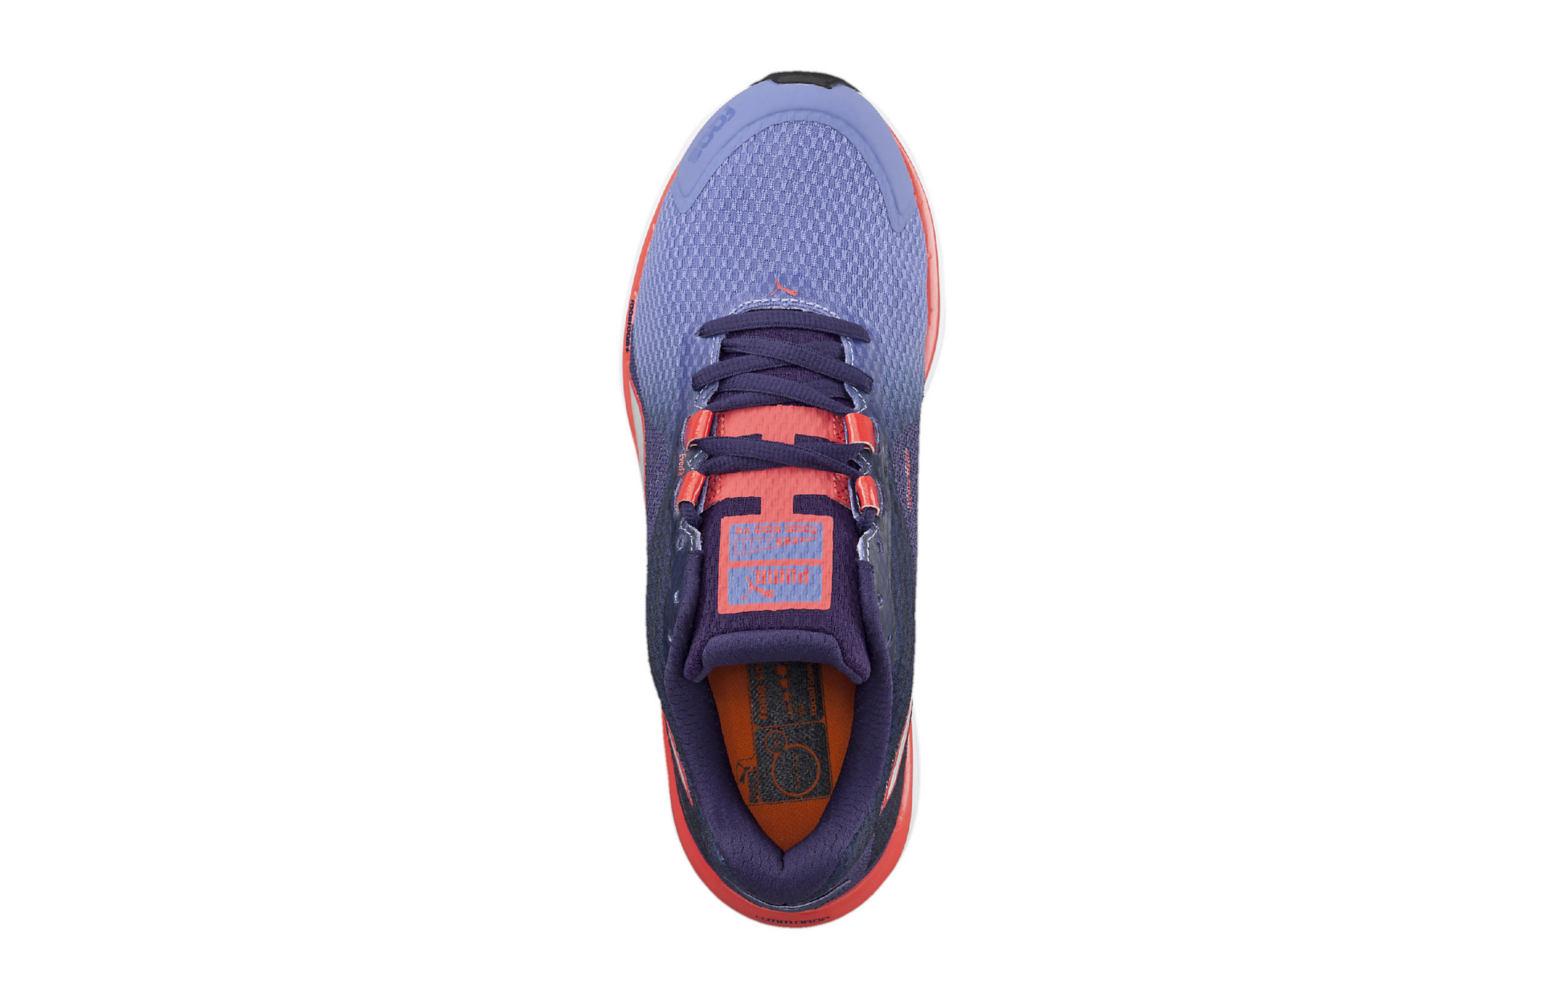 meilleures baskets 44078 8b77e PUMA FAAS 500 V4 Womens Running Shoes - Purple